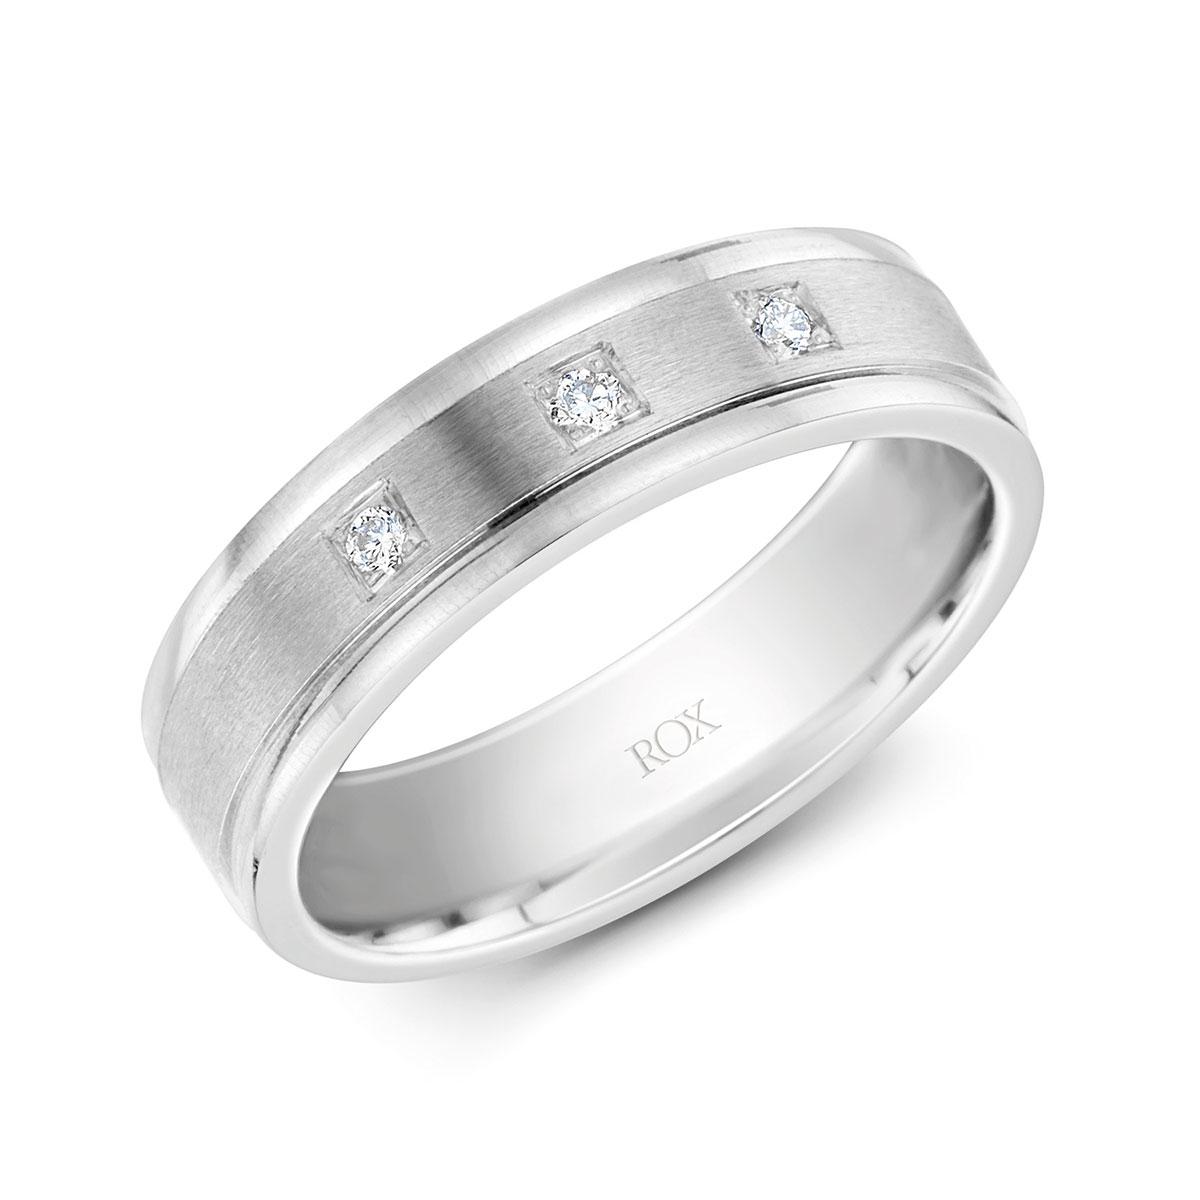 ROX Platinum Diamond Wedding Ring 0.08cts